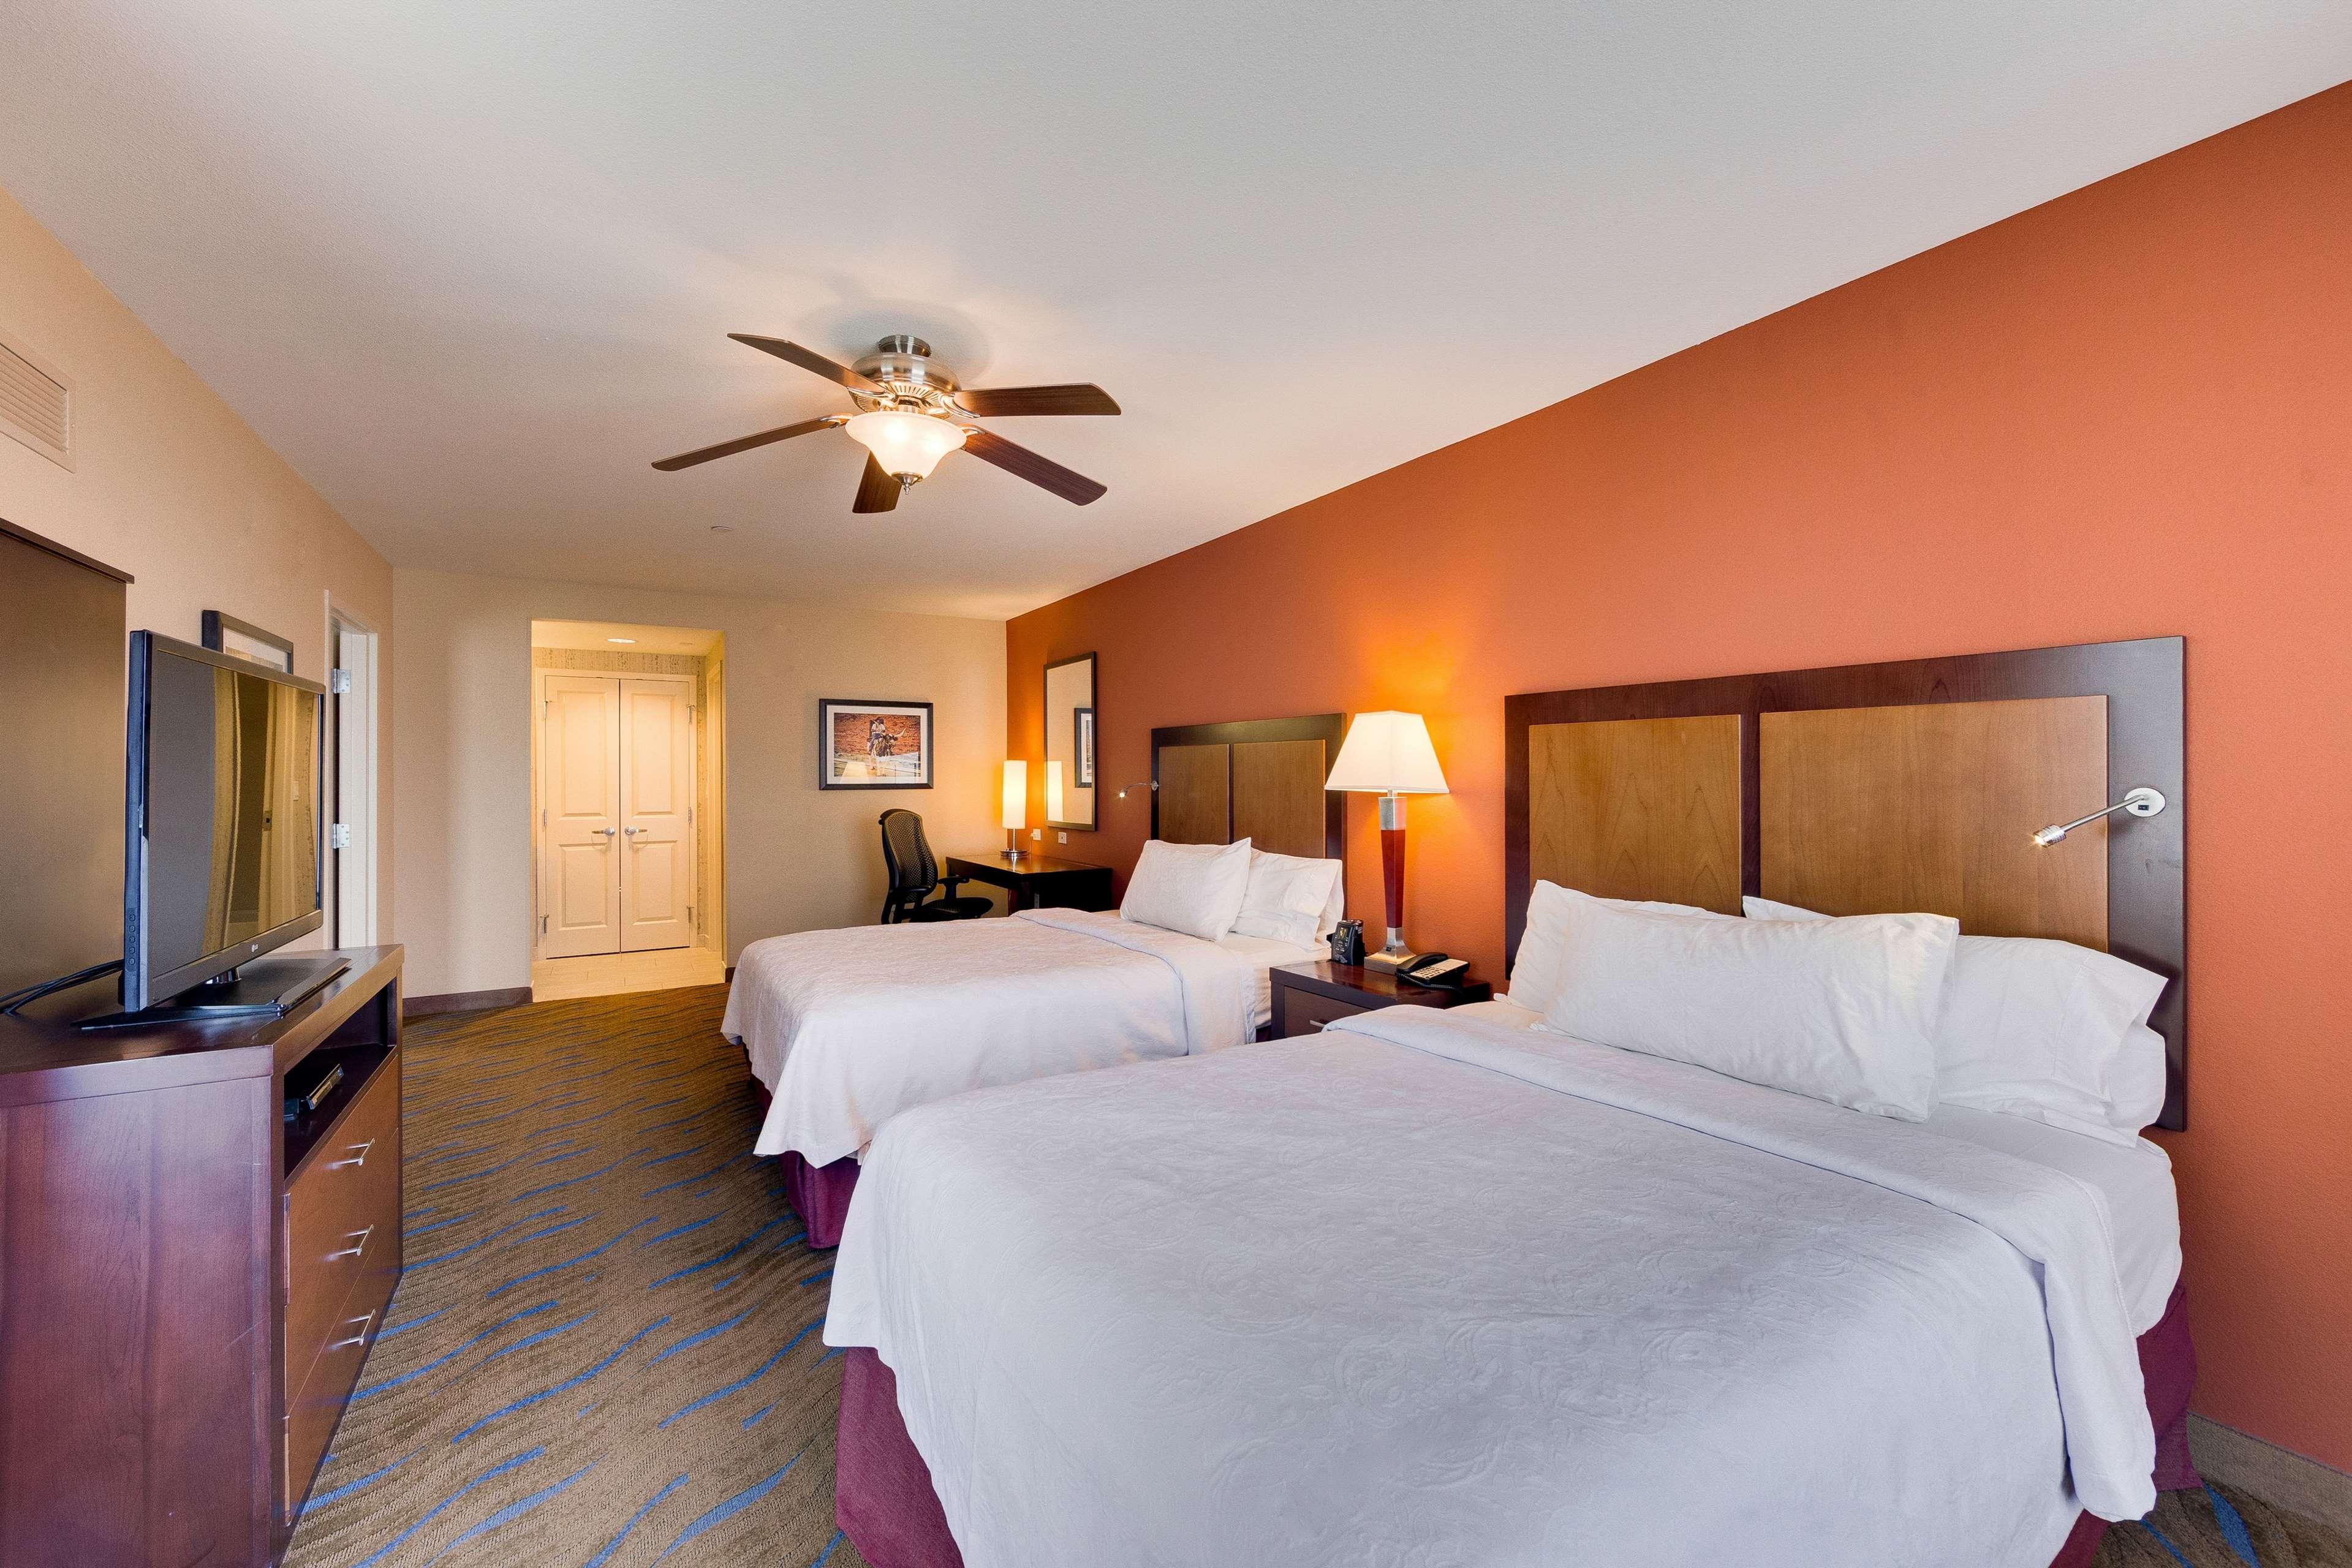 Homewood Suites by Hilton Fort Worth - Medical Center, TX image 13